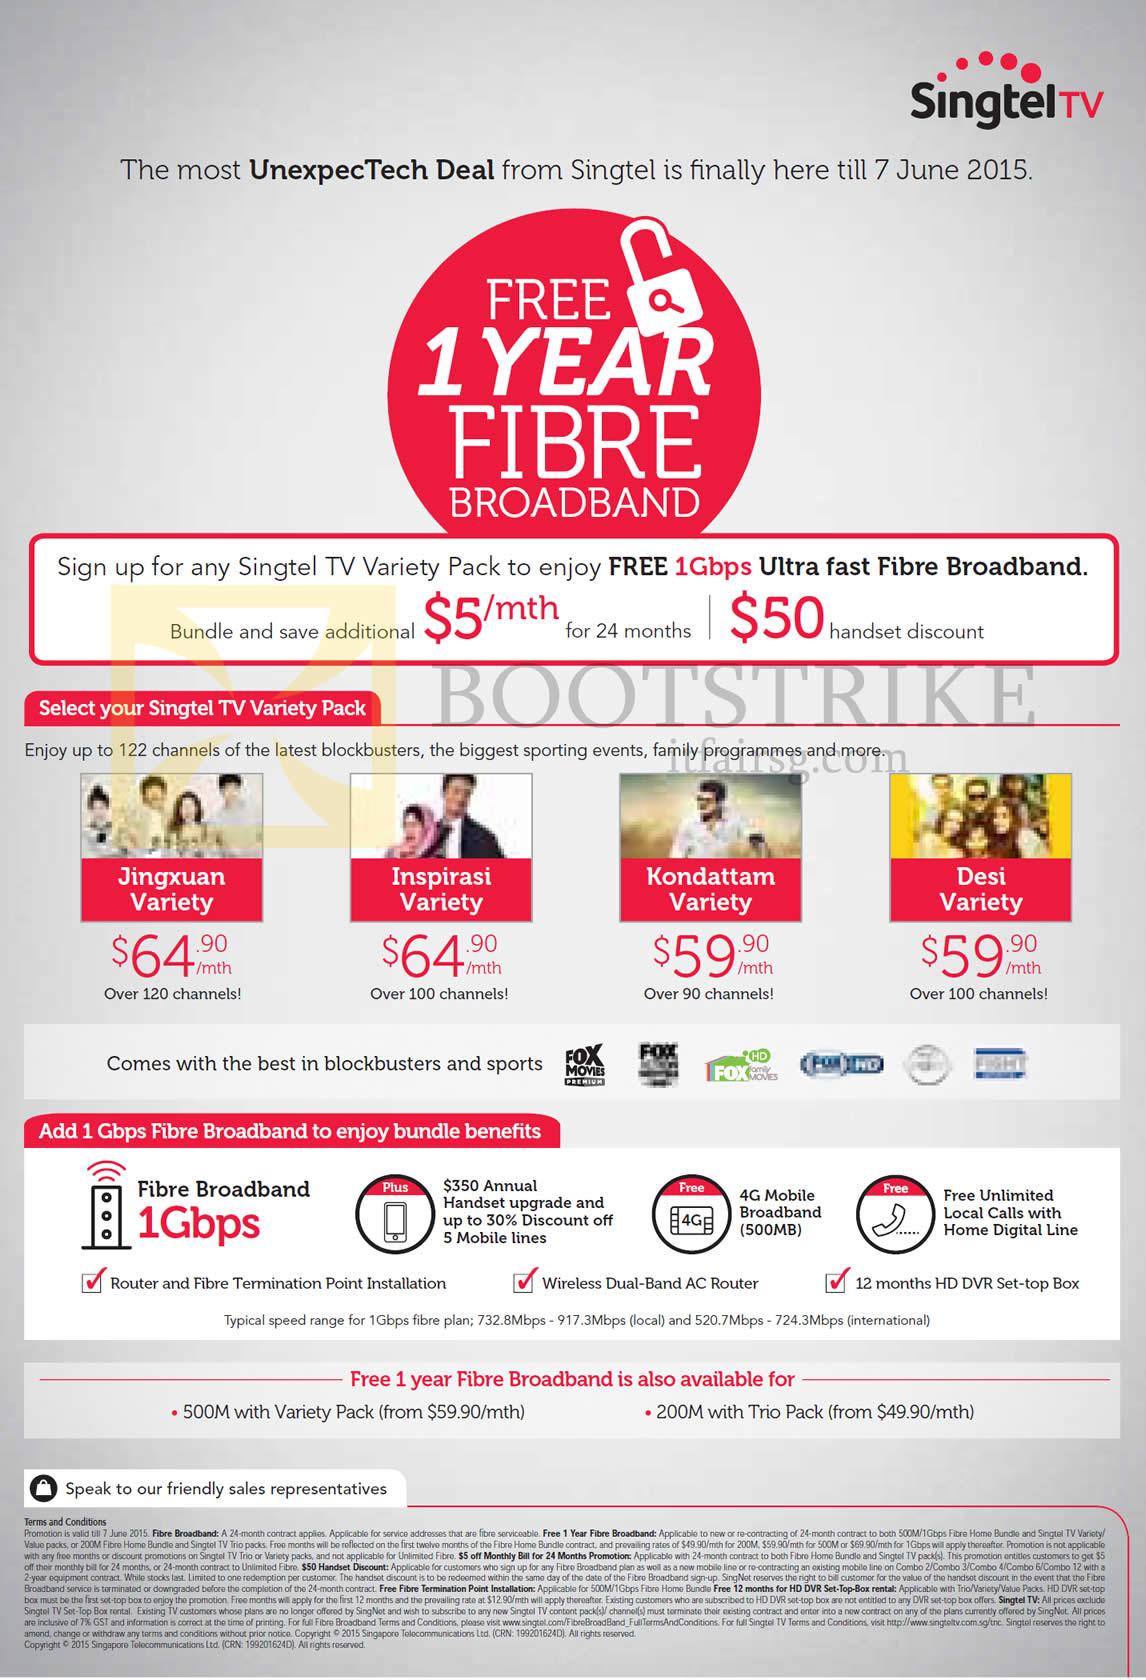 PC SHOW 2015 price list image brochure of Singtel TV Variety Packs Free 1Gbps Fibre Broadband